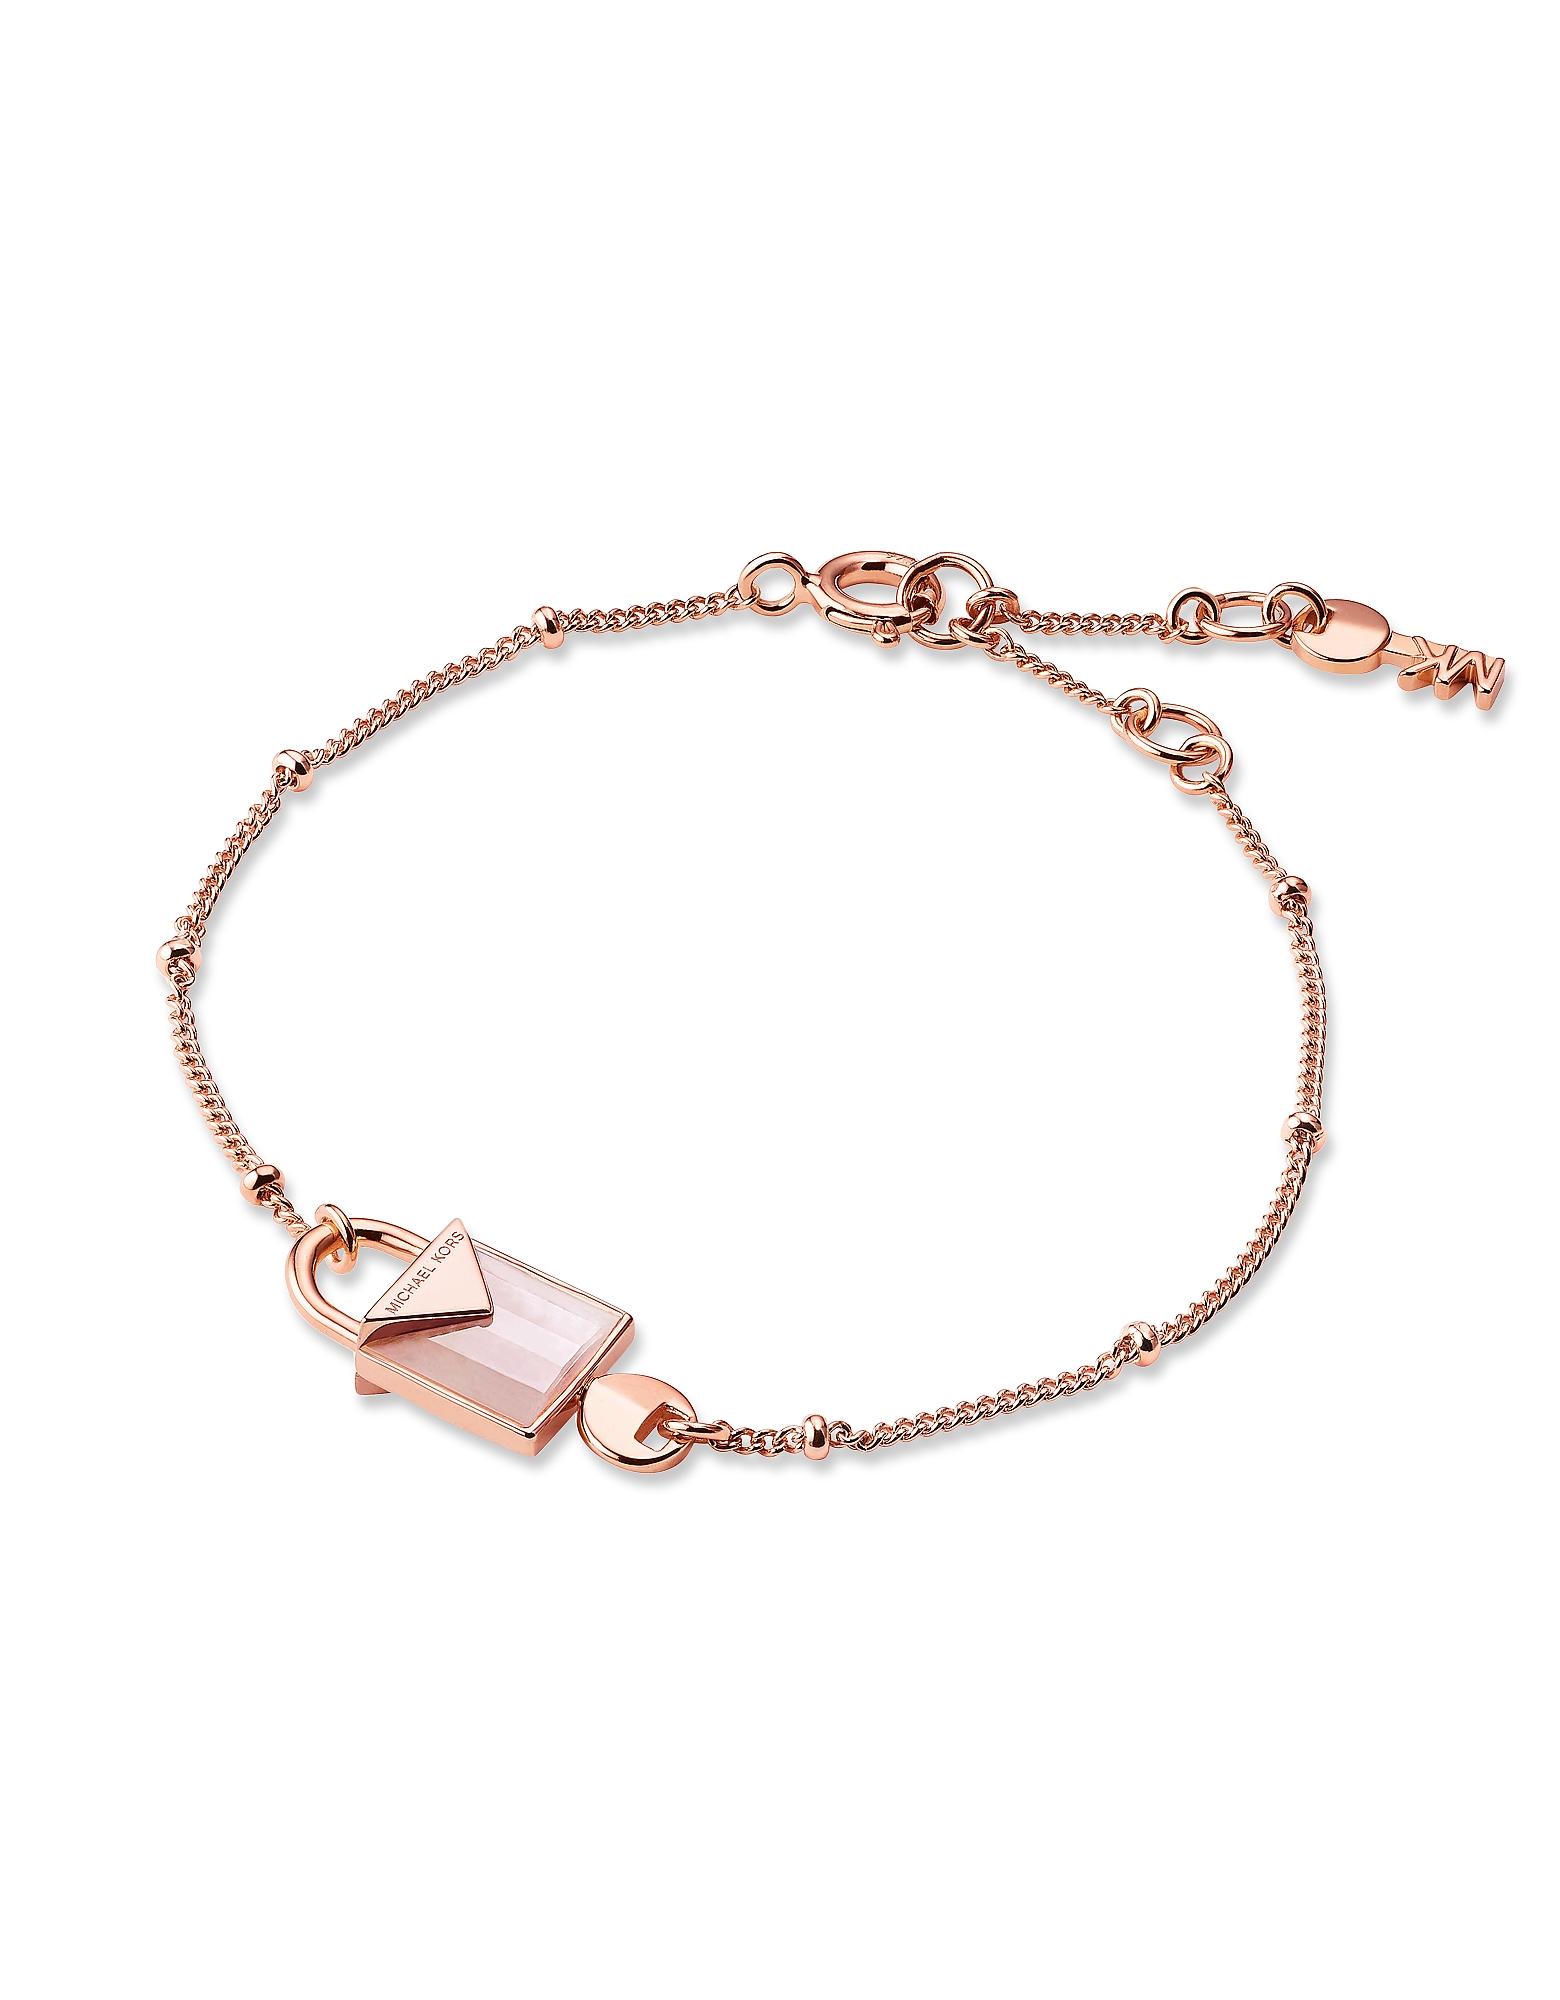 Mercer 14K Rose Gold Plated Sterling Silver Lock Bracelet